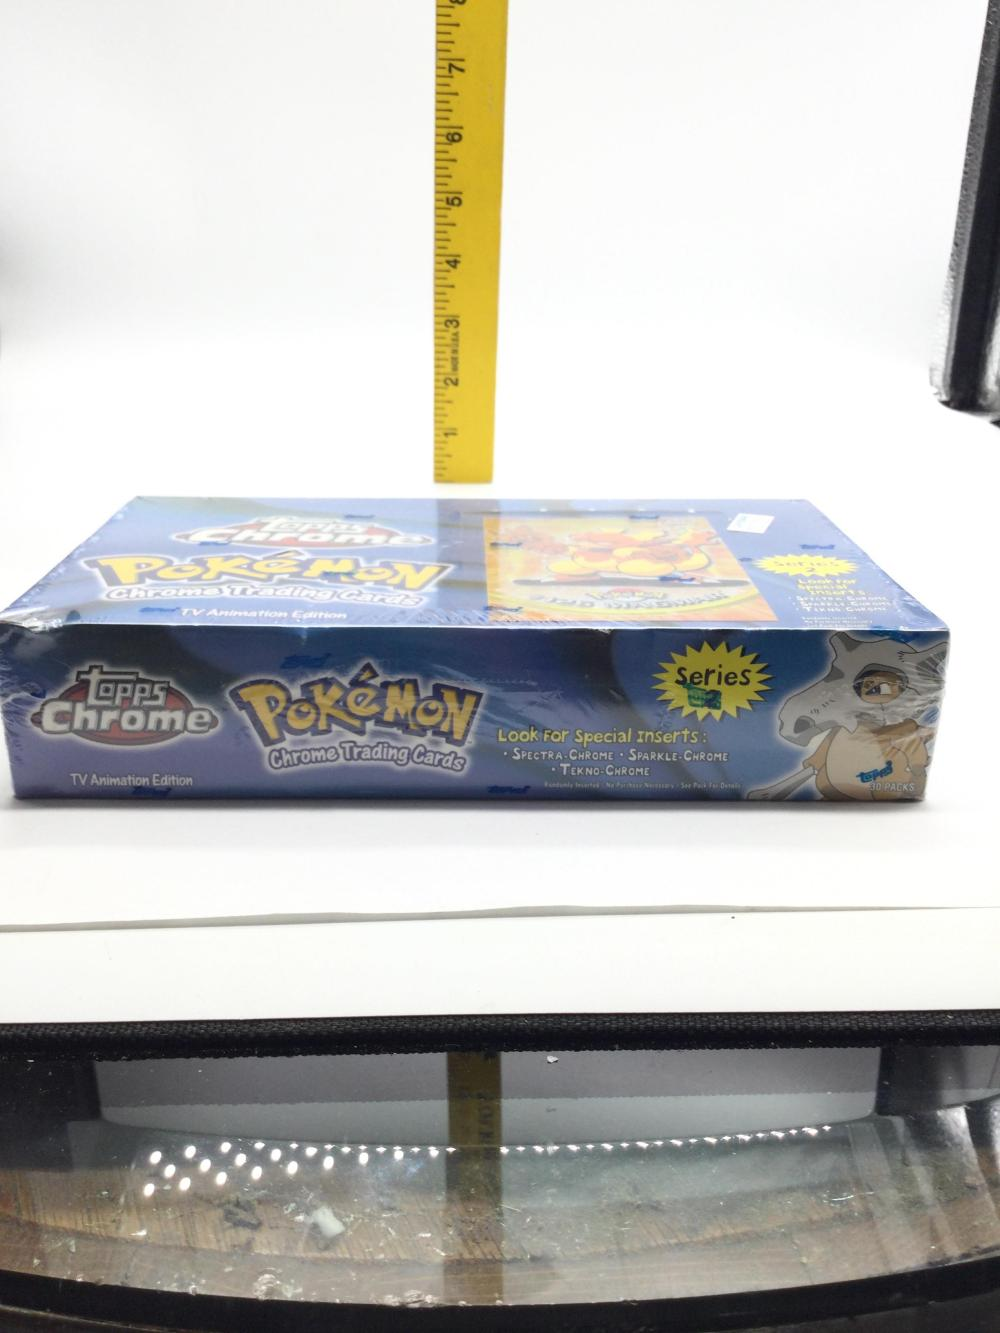 Pokémon Topps Chrome Trading Cards Sealed Box